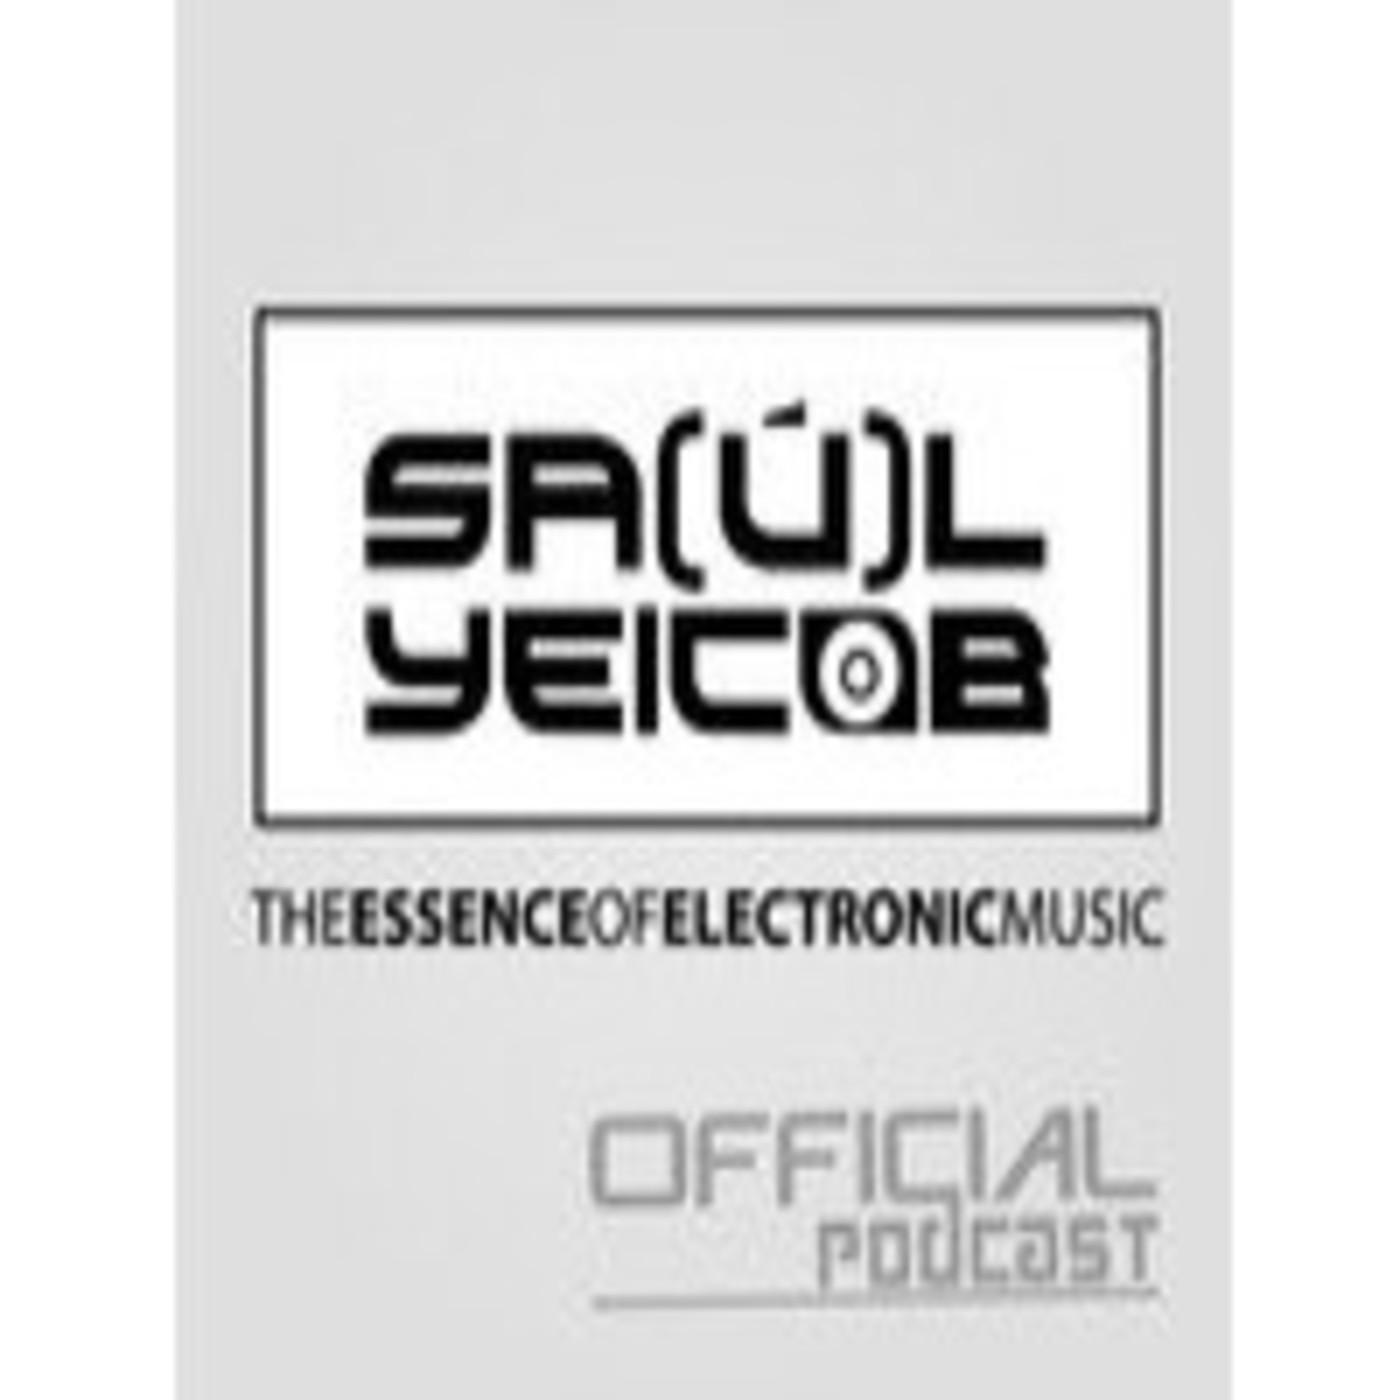 <![CDATA[Saul Yeicob - The essence of electronic music]]>